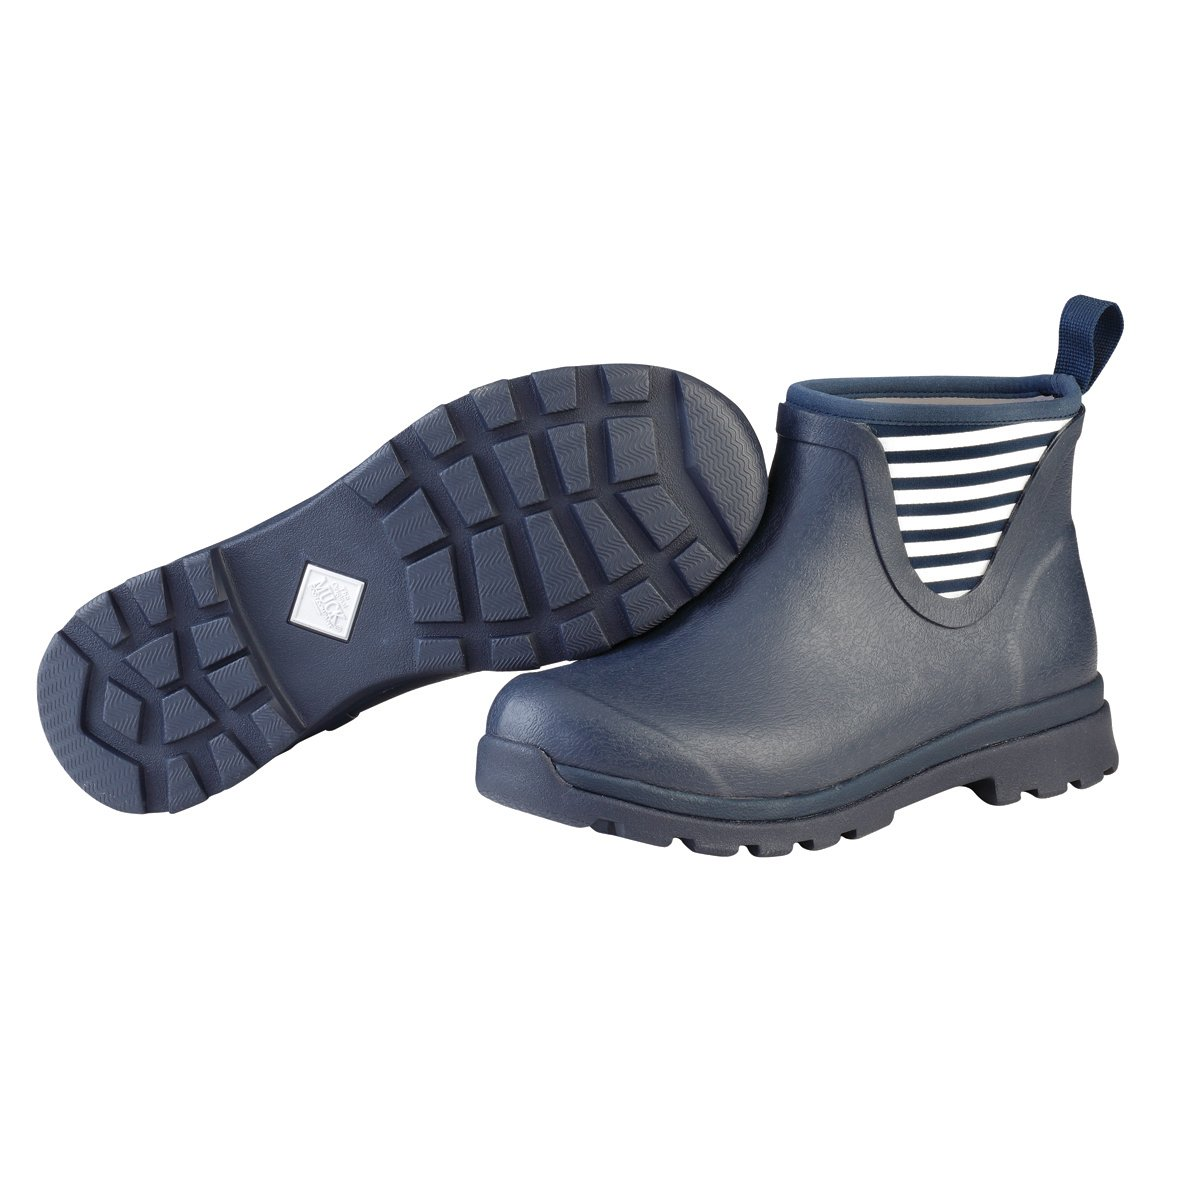 Muck Boot Women's Cambridge Ankle Snow B01NBUPYG6 5 B(M) US|Navy/White Stripes